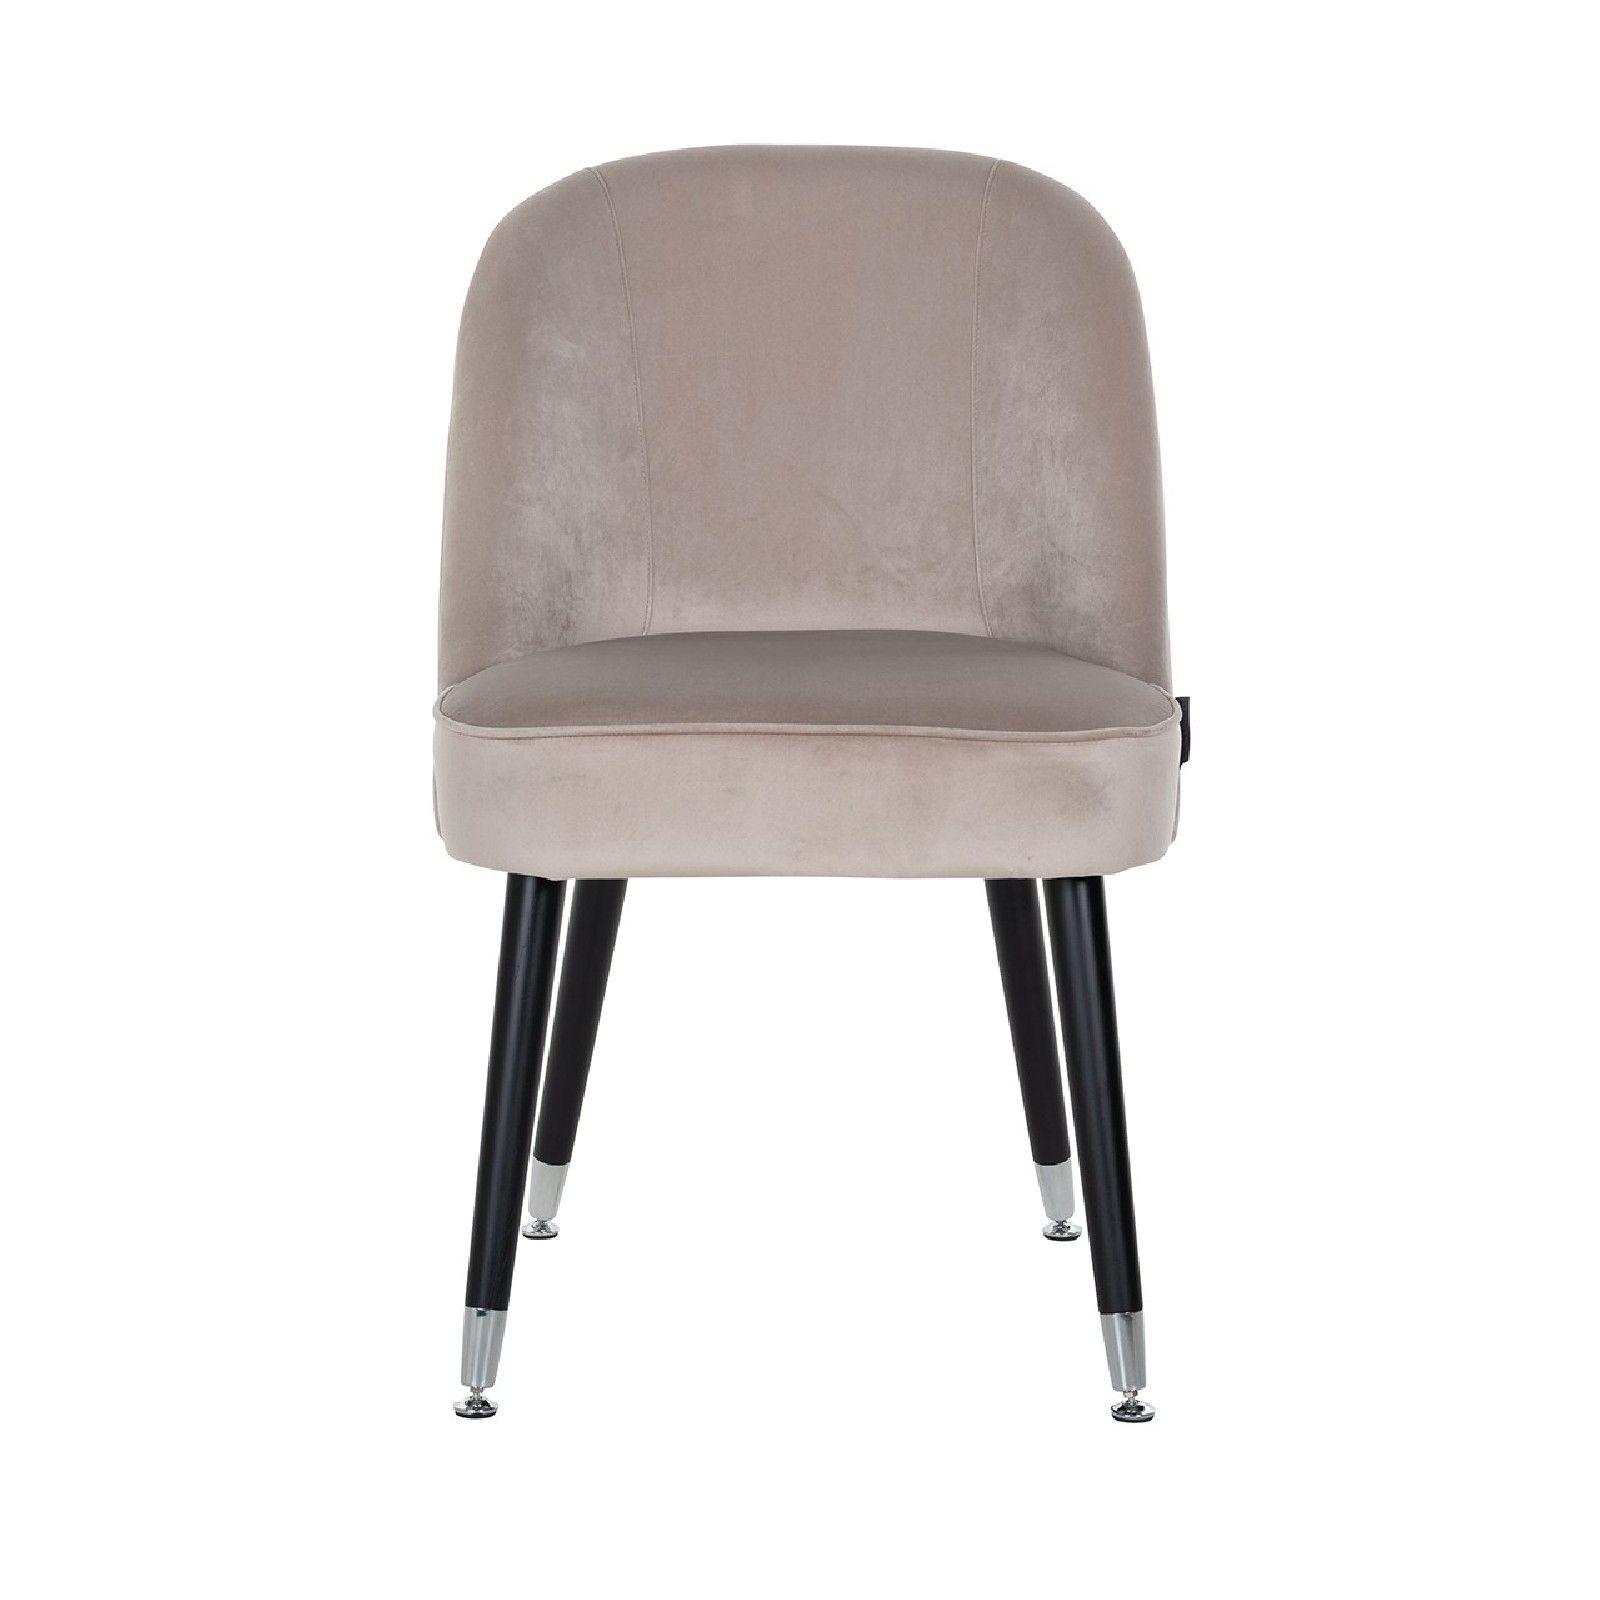 Chaise Julius Khaki Velvet, Silver footcap Salle à manger - 58